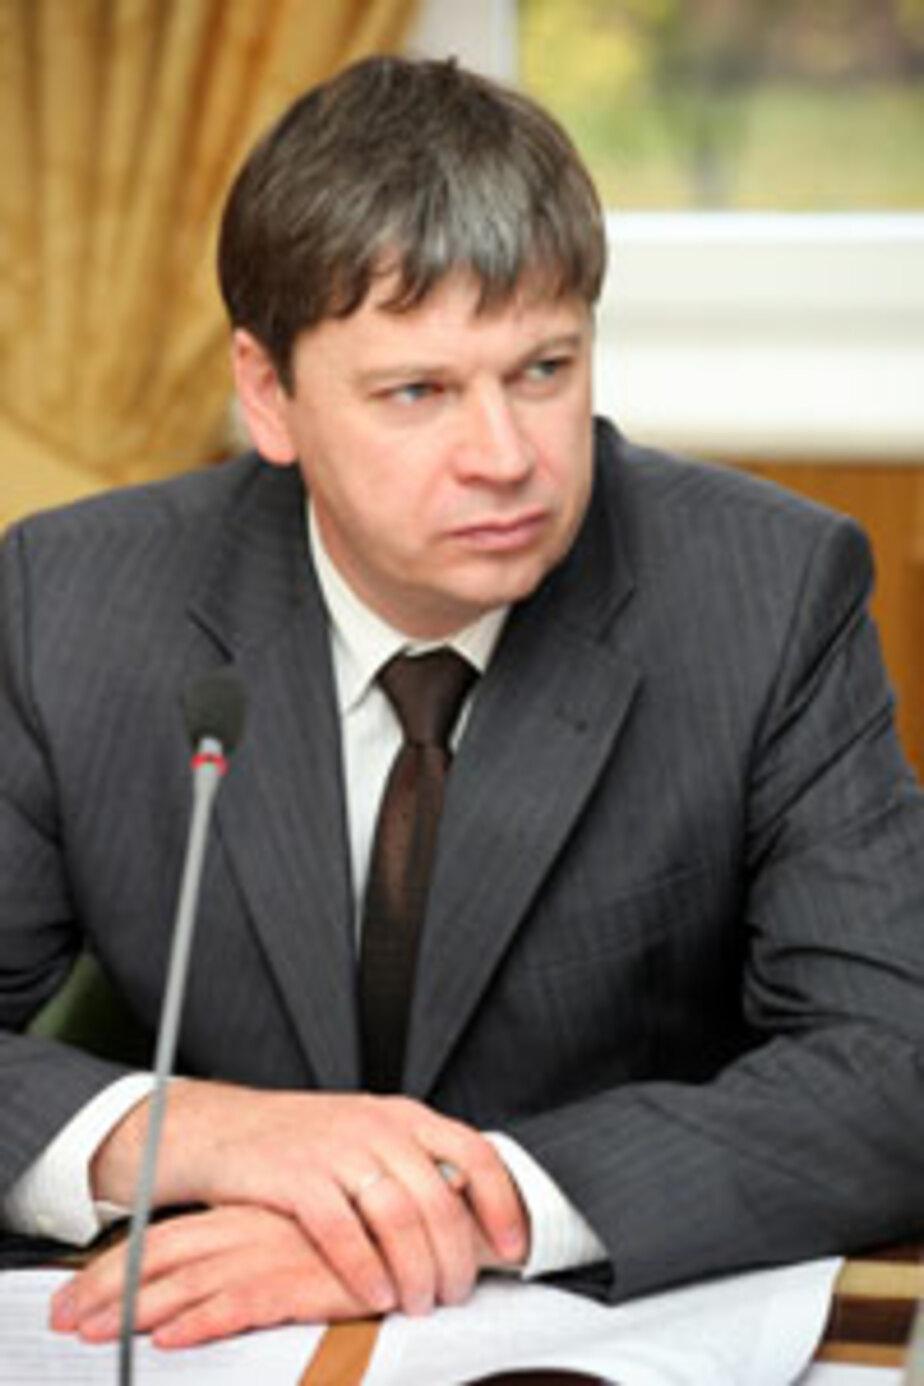 Министр финансов области избавился от приставки и-о- - Новости Калининграда